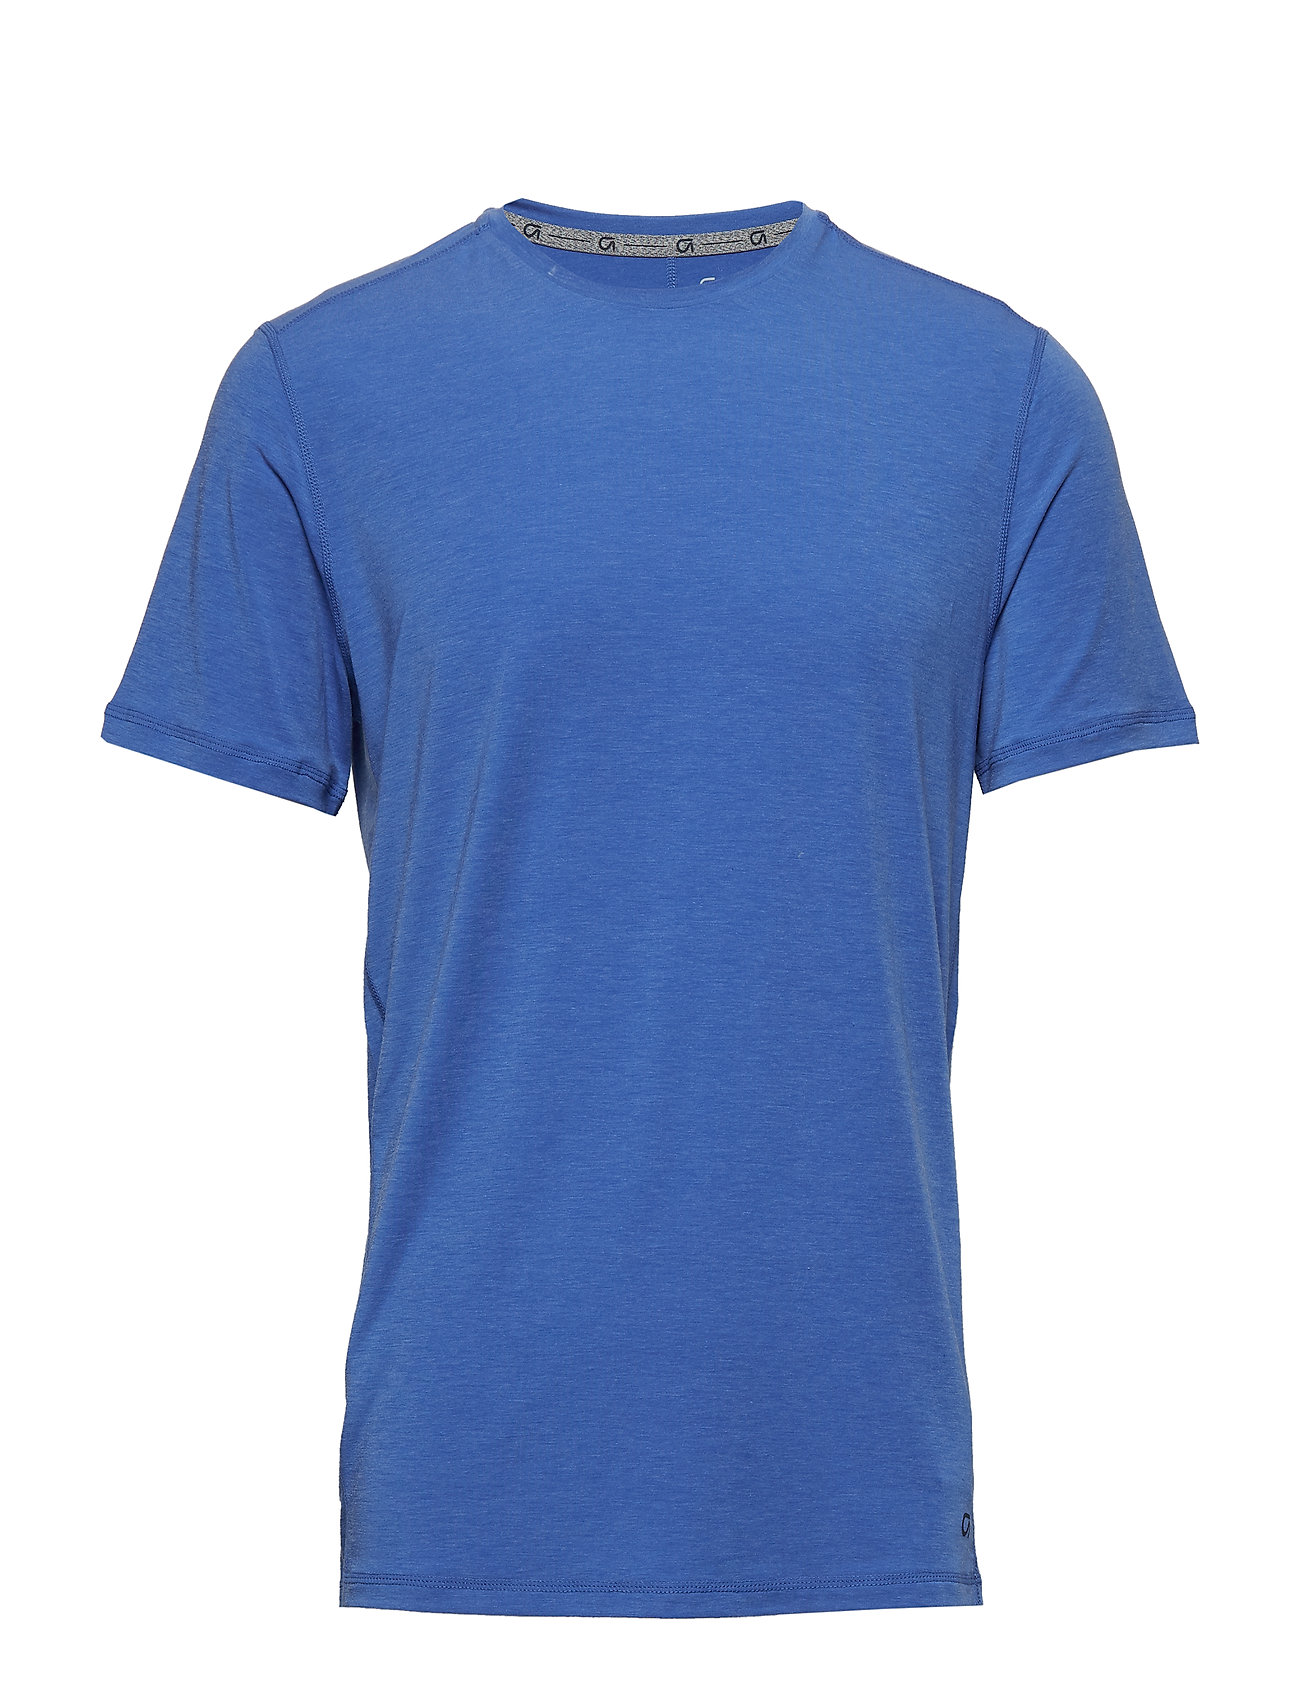 GAP GapFit Breathe Classic T-Shirt - BRISTOL BLUE 2